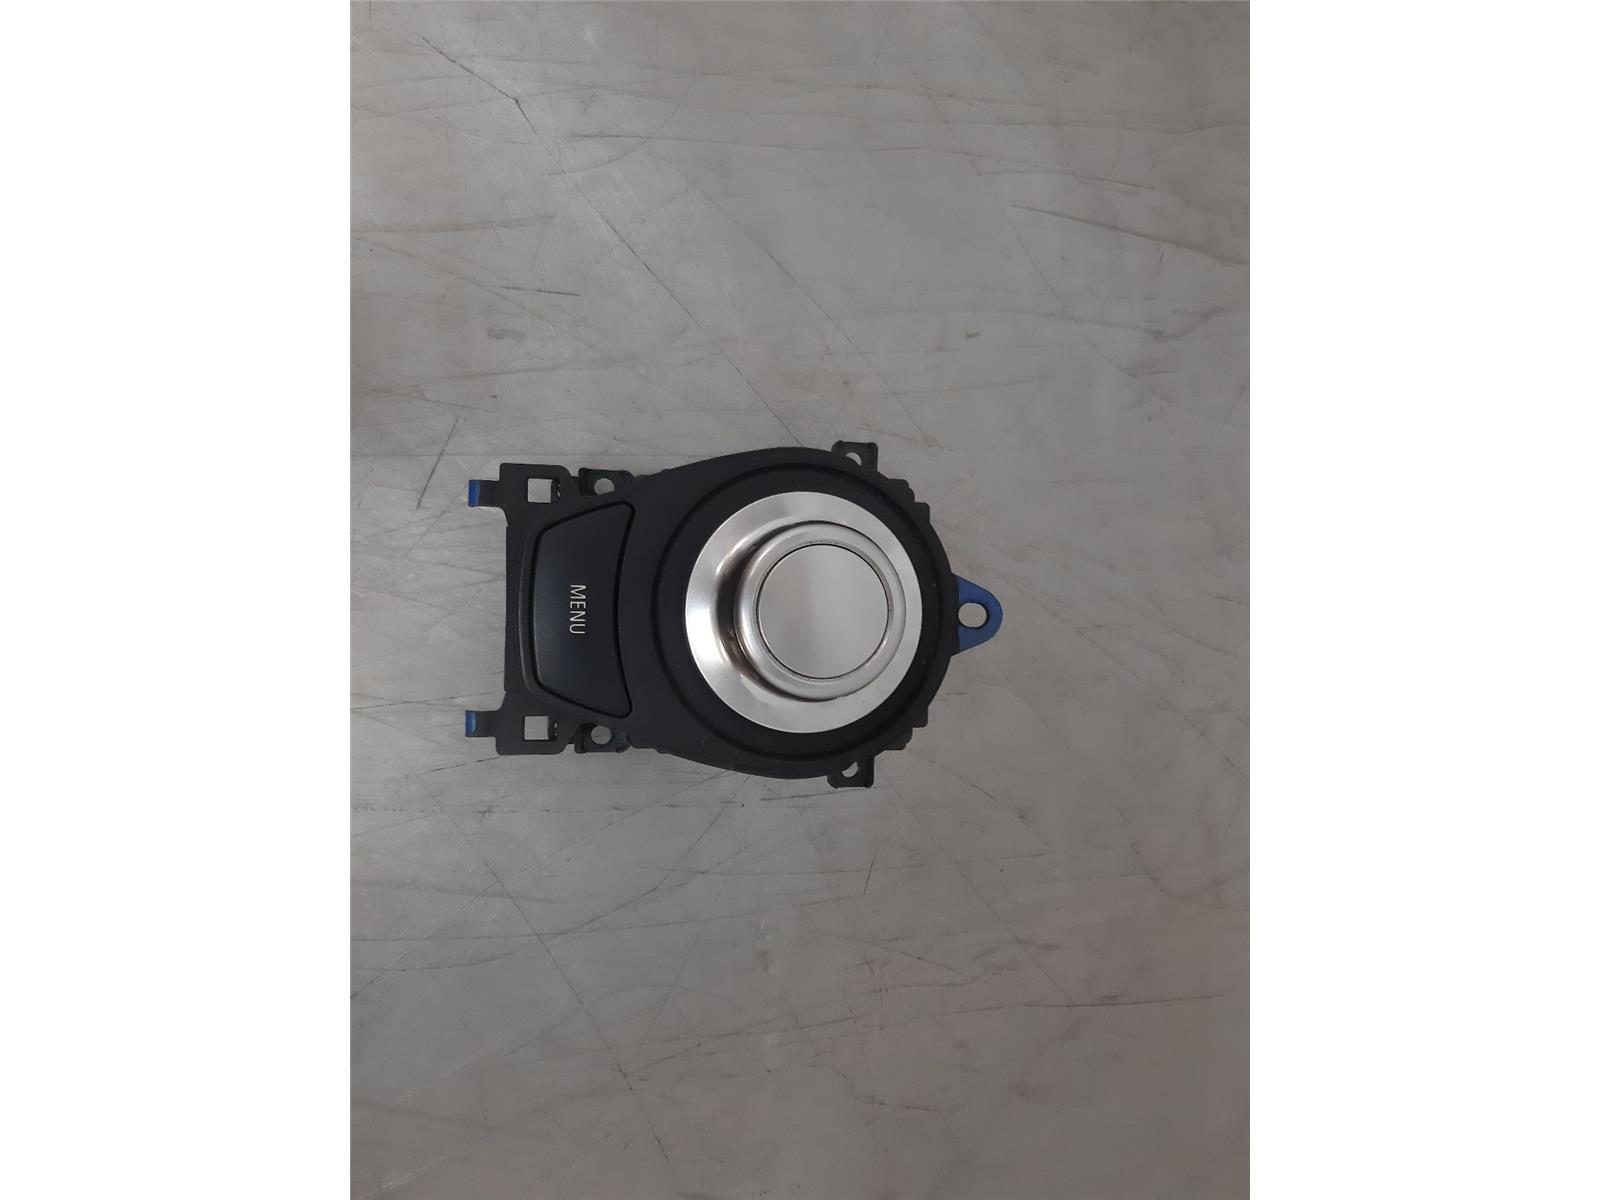 BMW E90 3 SERIES I Drive Controller 65826987864